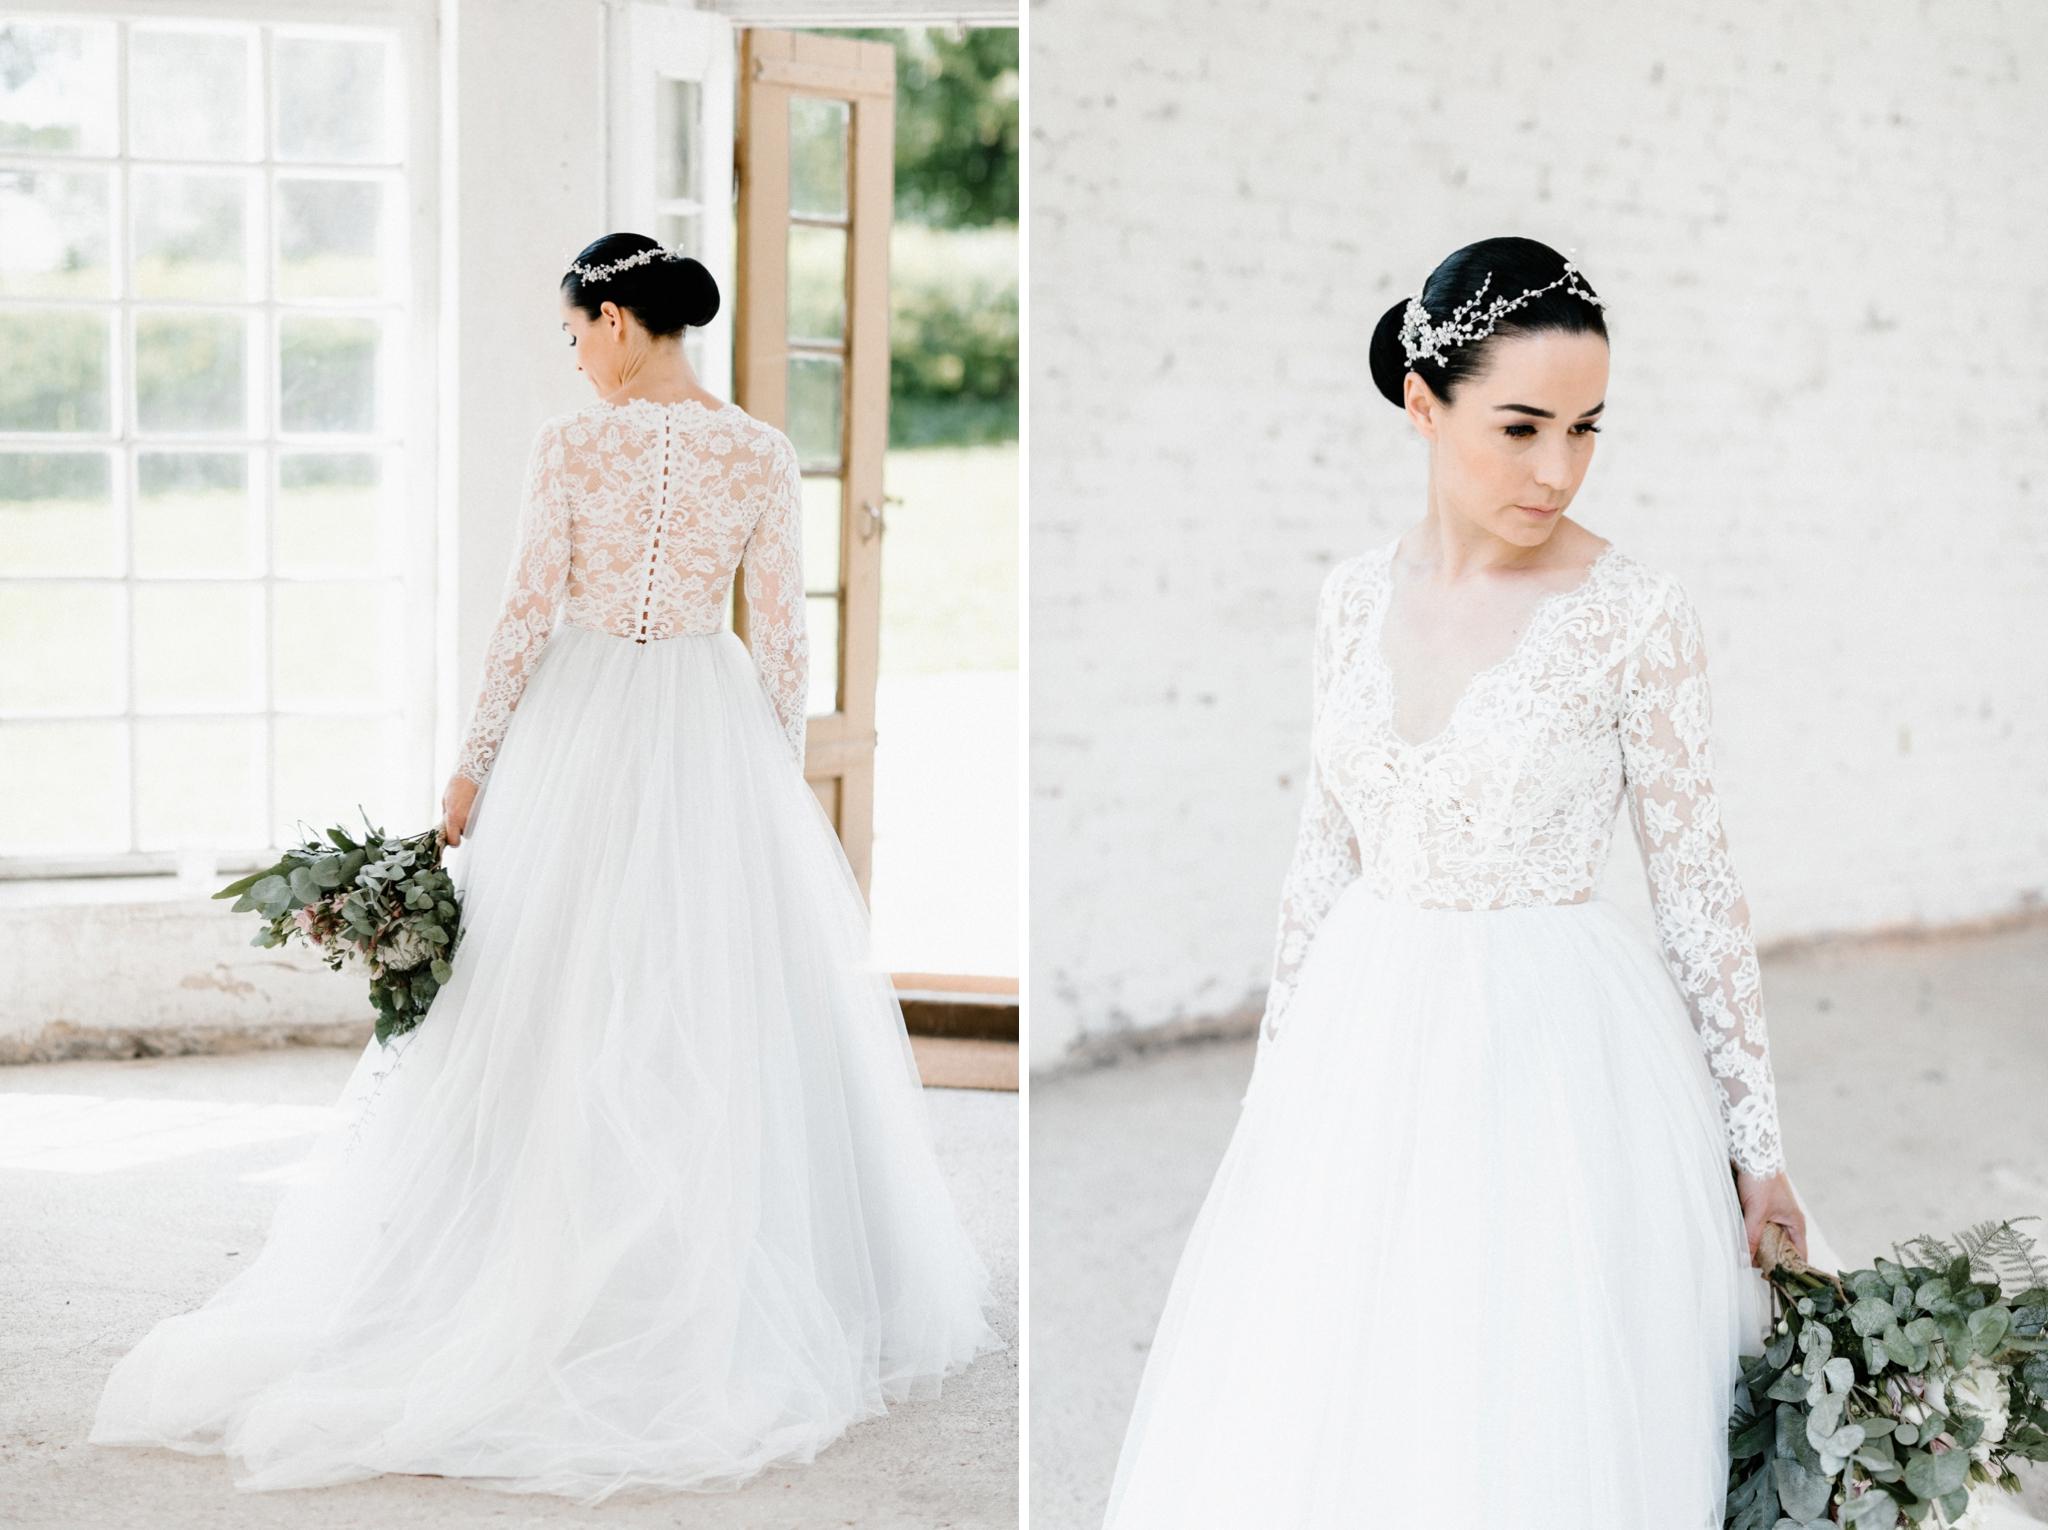 Essi + Ville | Oitbacka Gården | by Patrick Karkkolainen Wedding Photography-81.jpg